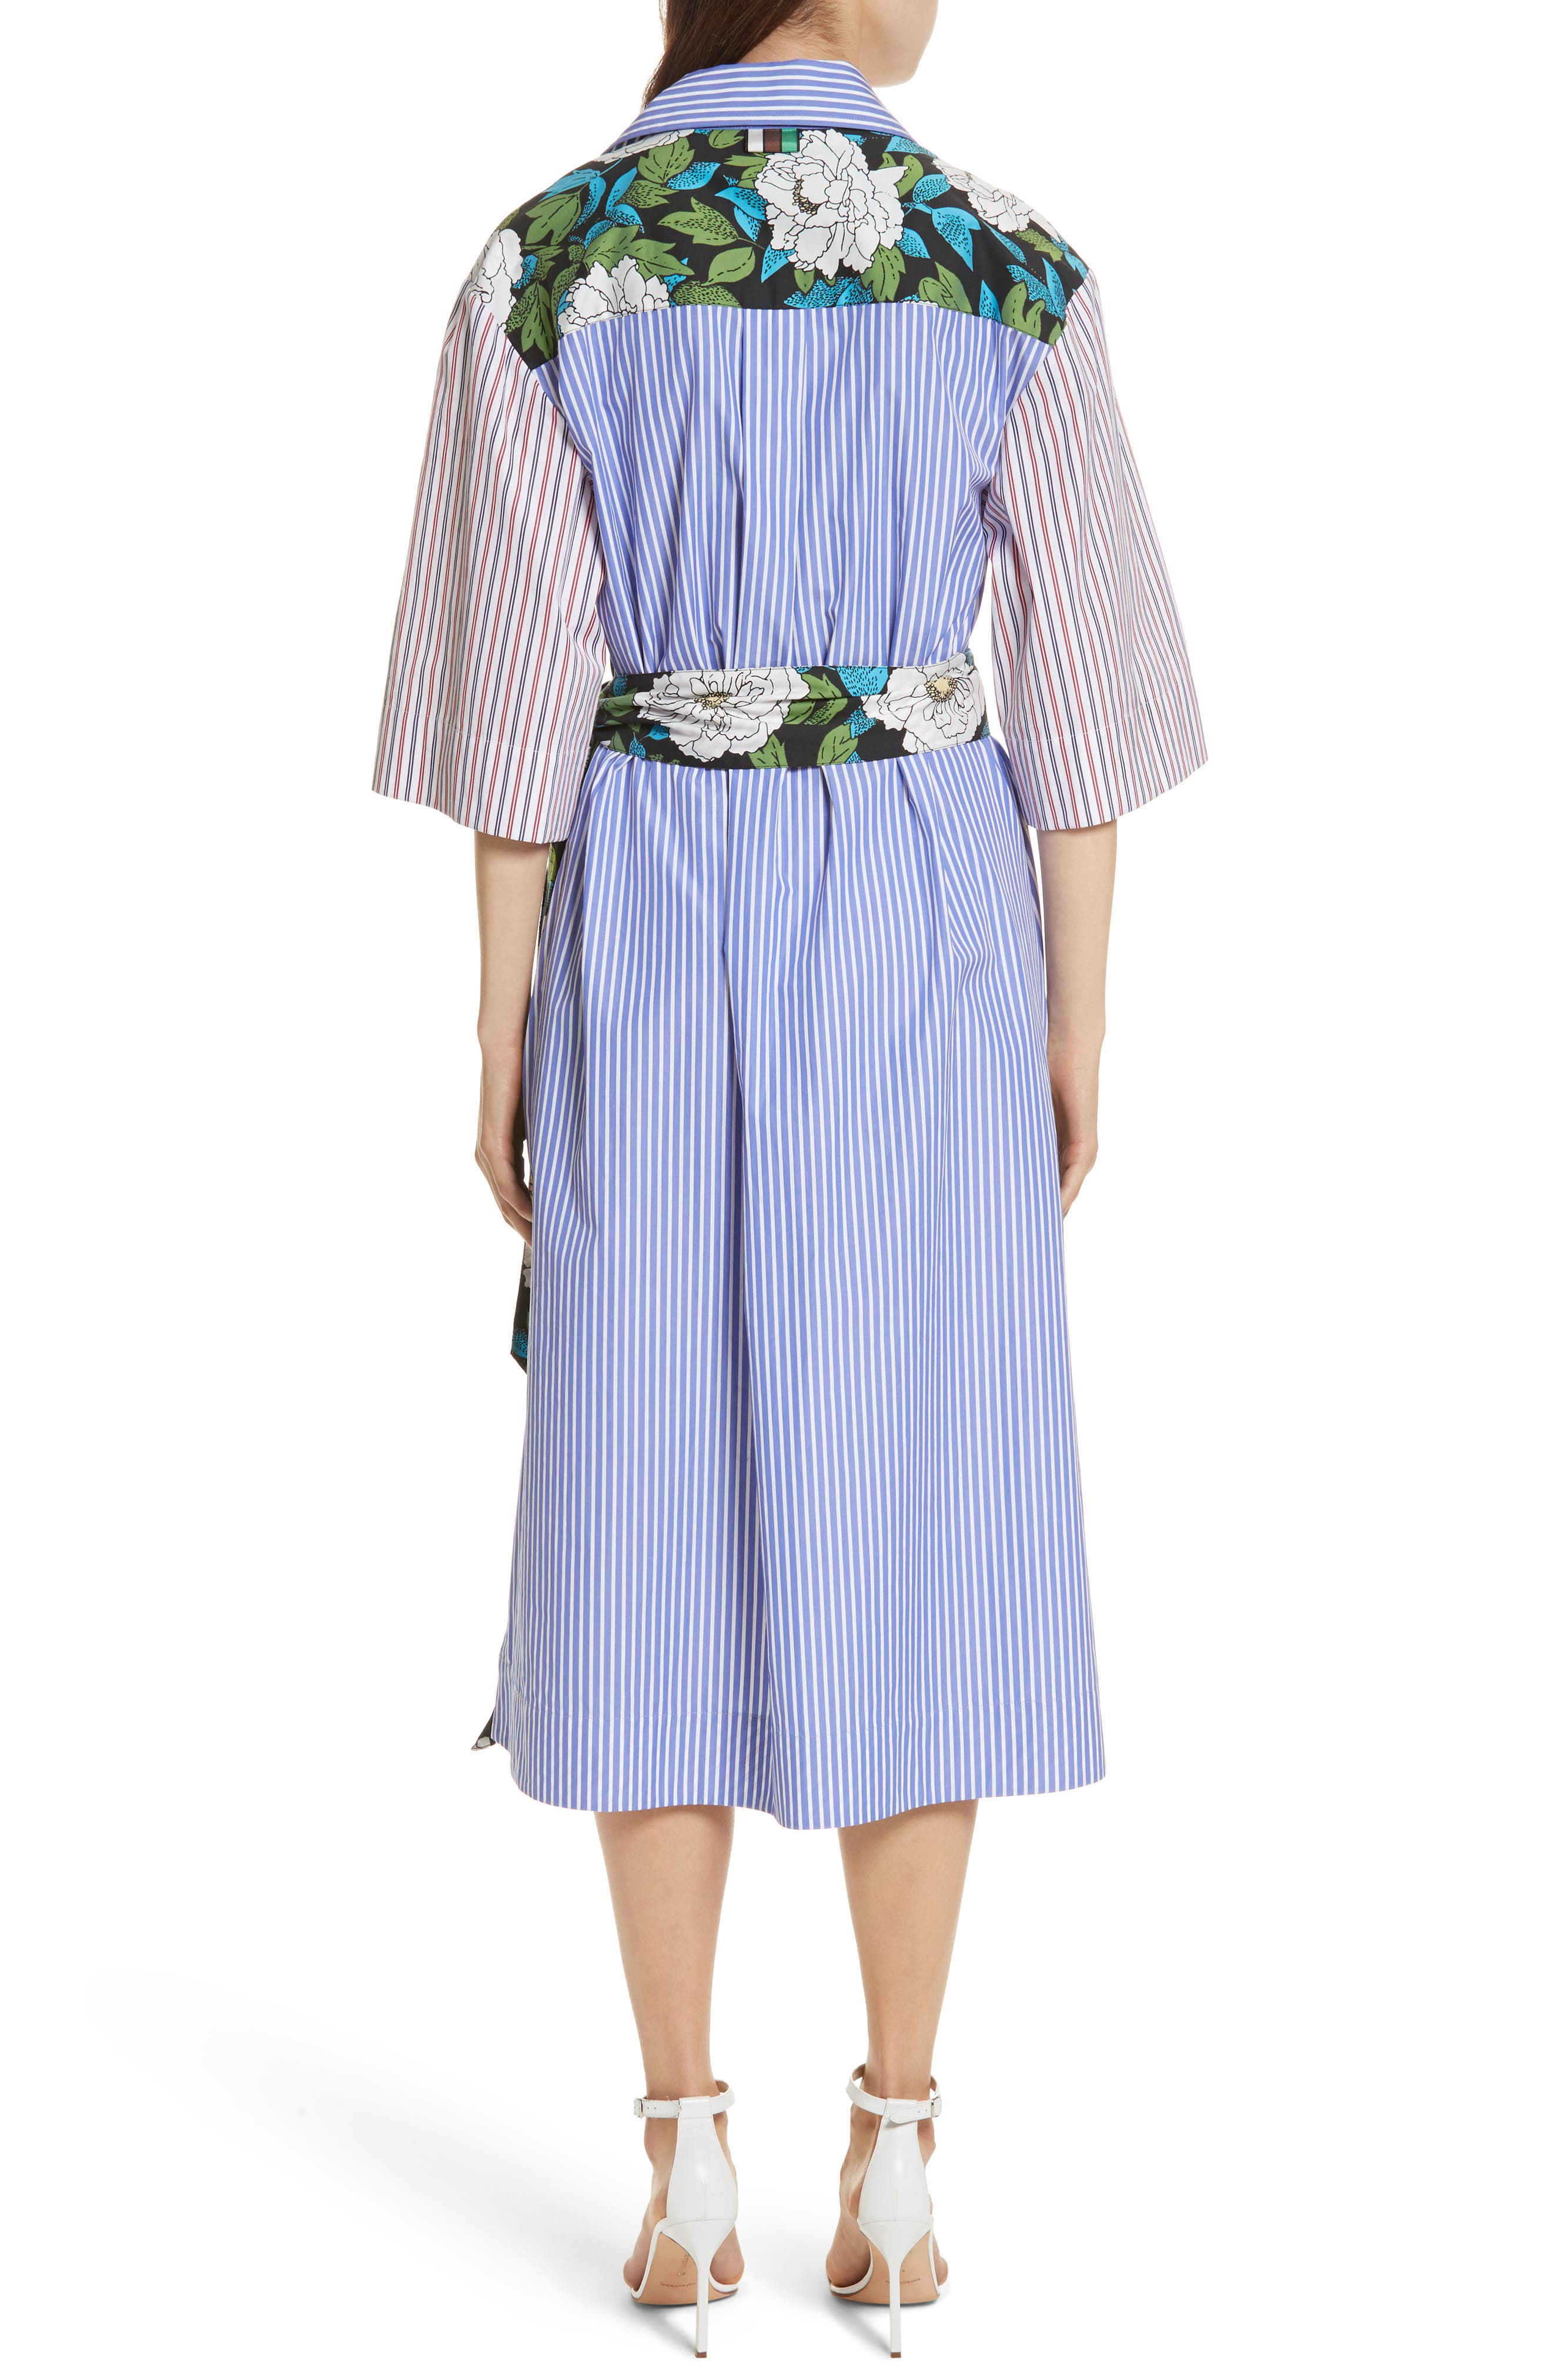 Diane von Furstenberg Mixed Print Cotton Shirtdress,                             Alternate thumbnail 2, color,                             Blue White Wide Stripe